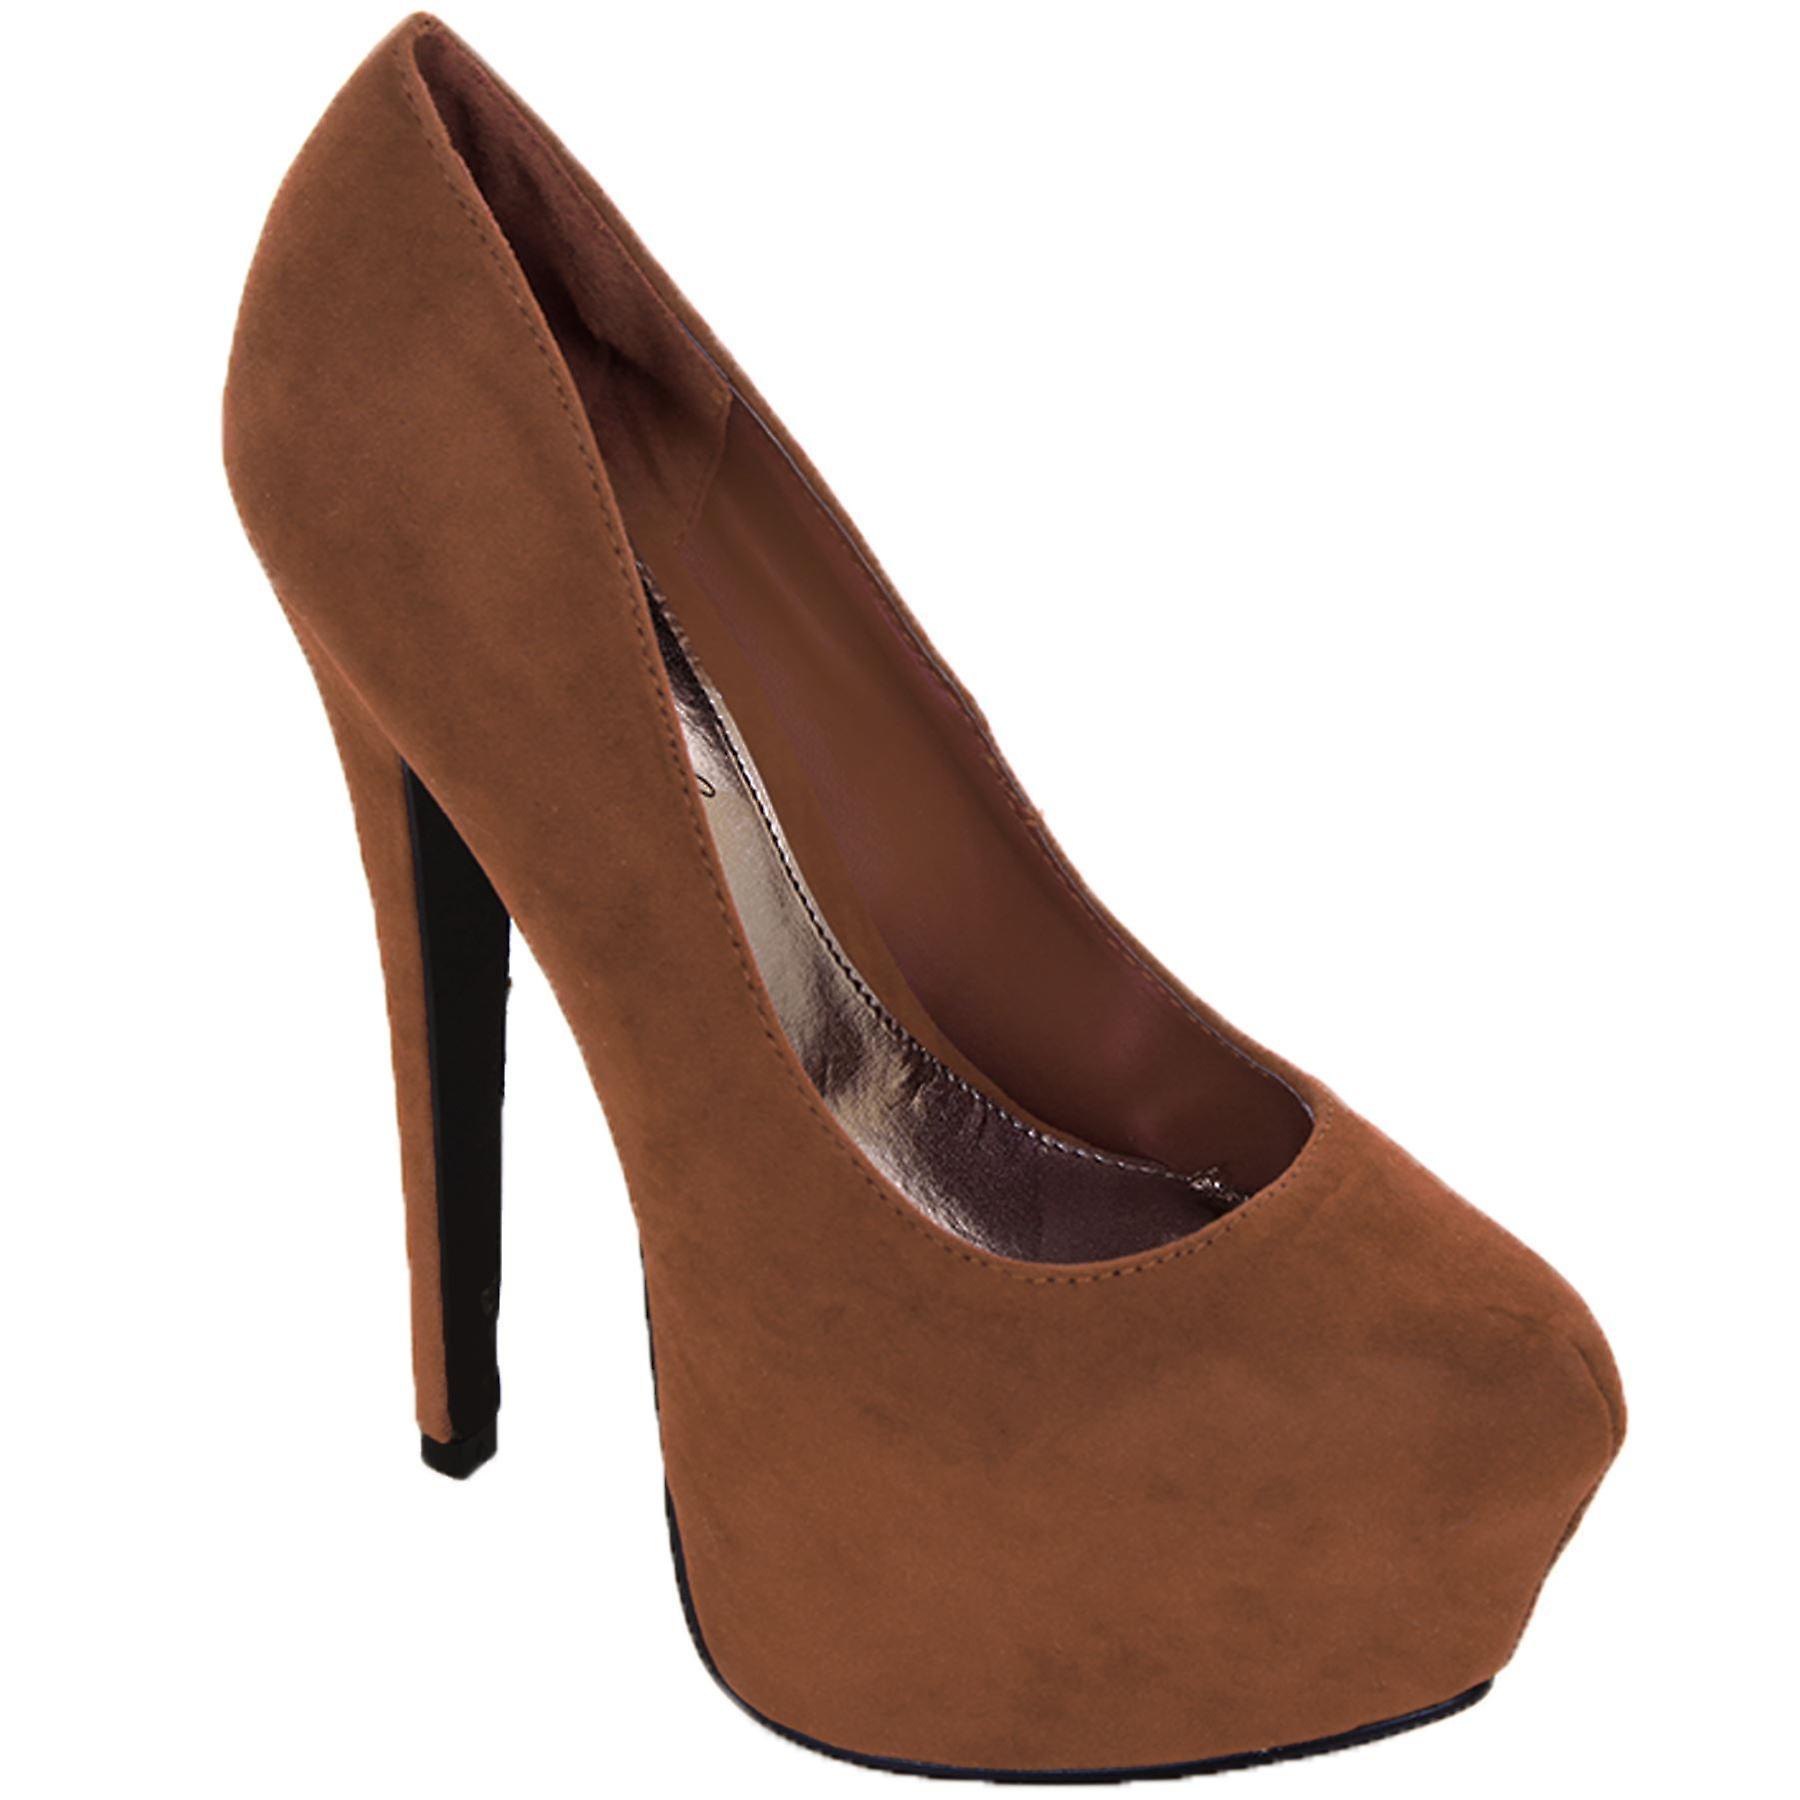 Ladies High Heel Suede Patent Shoes Women's Platform Slip On Party Heels